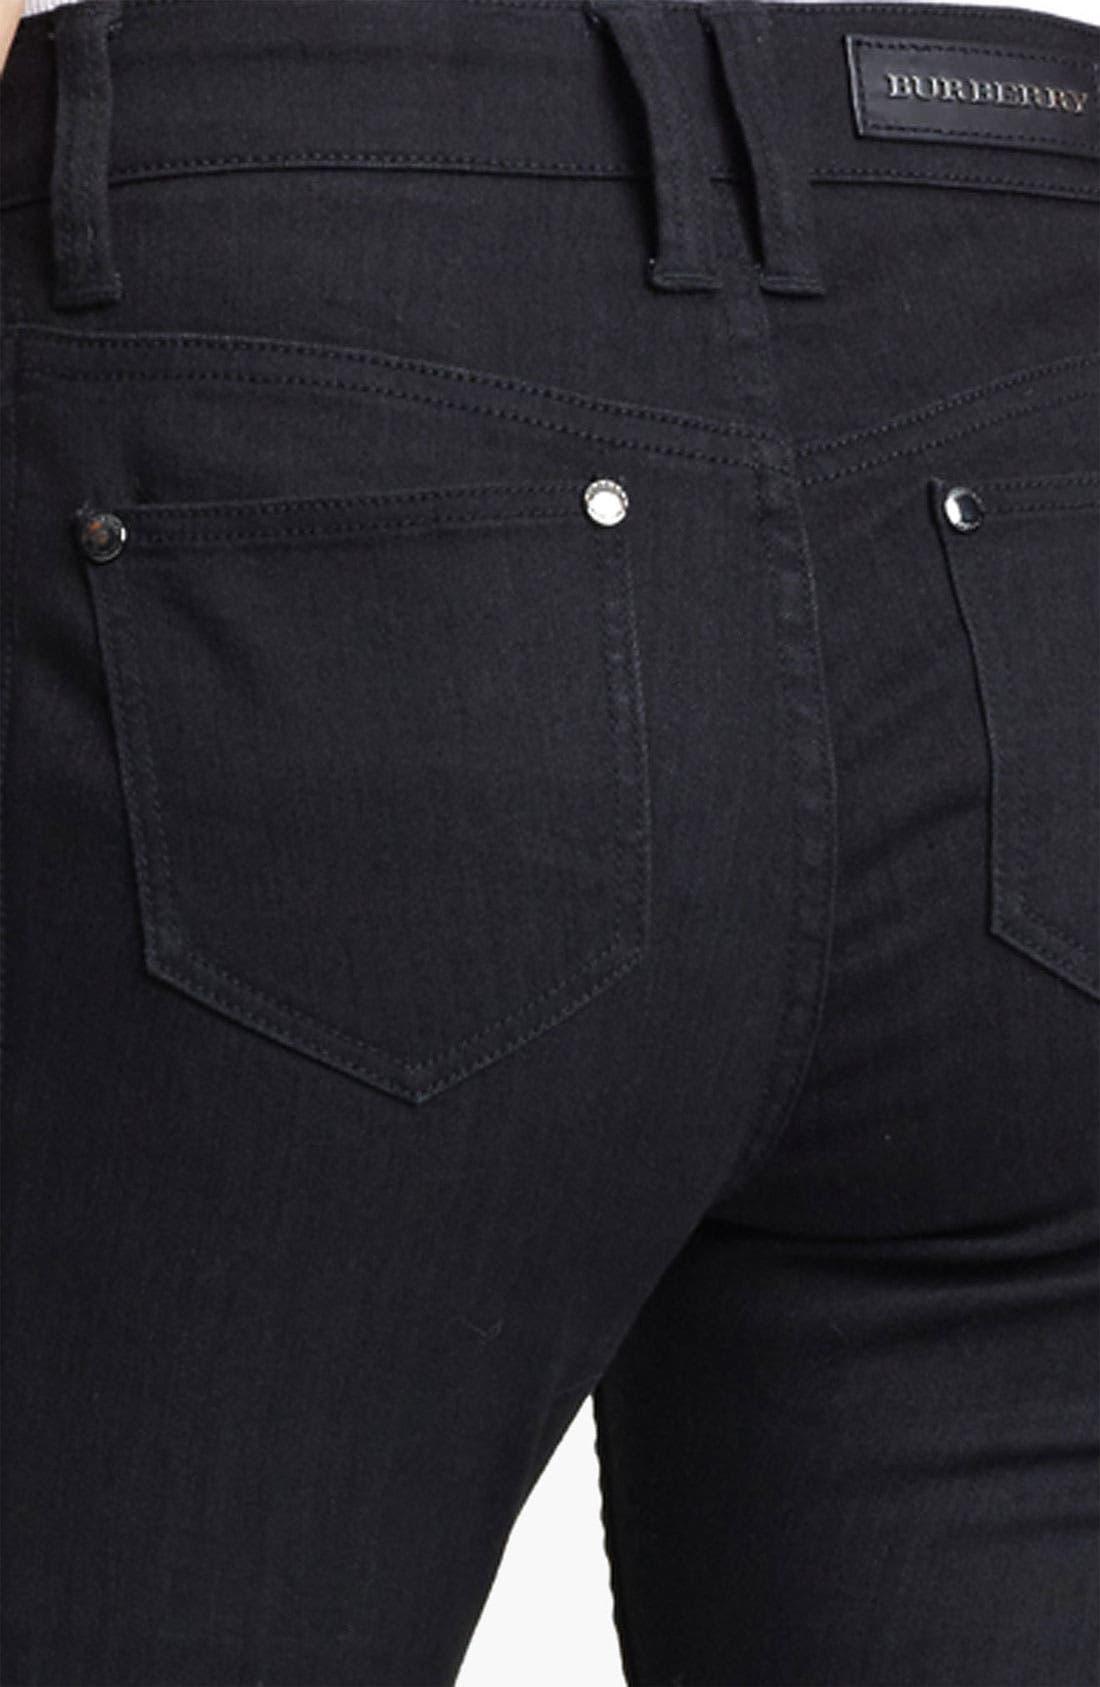 Alternate Image 3  - Burberry London Skinny Stretch Jeans